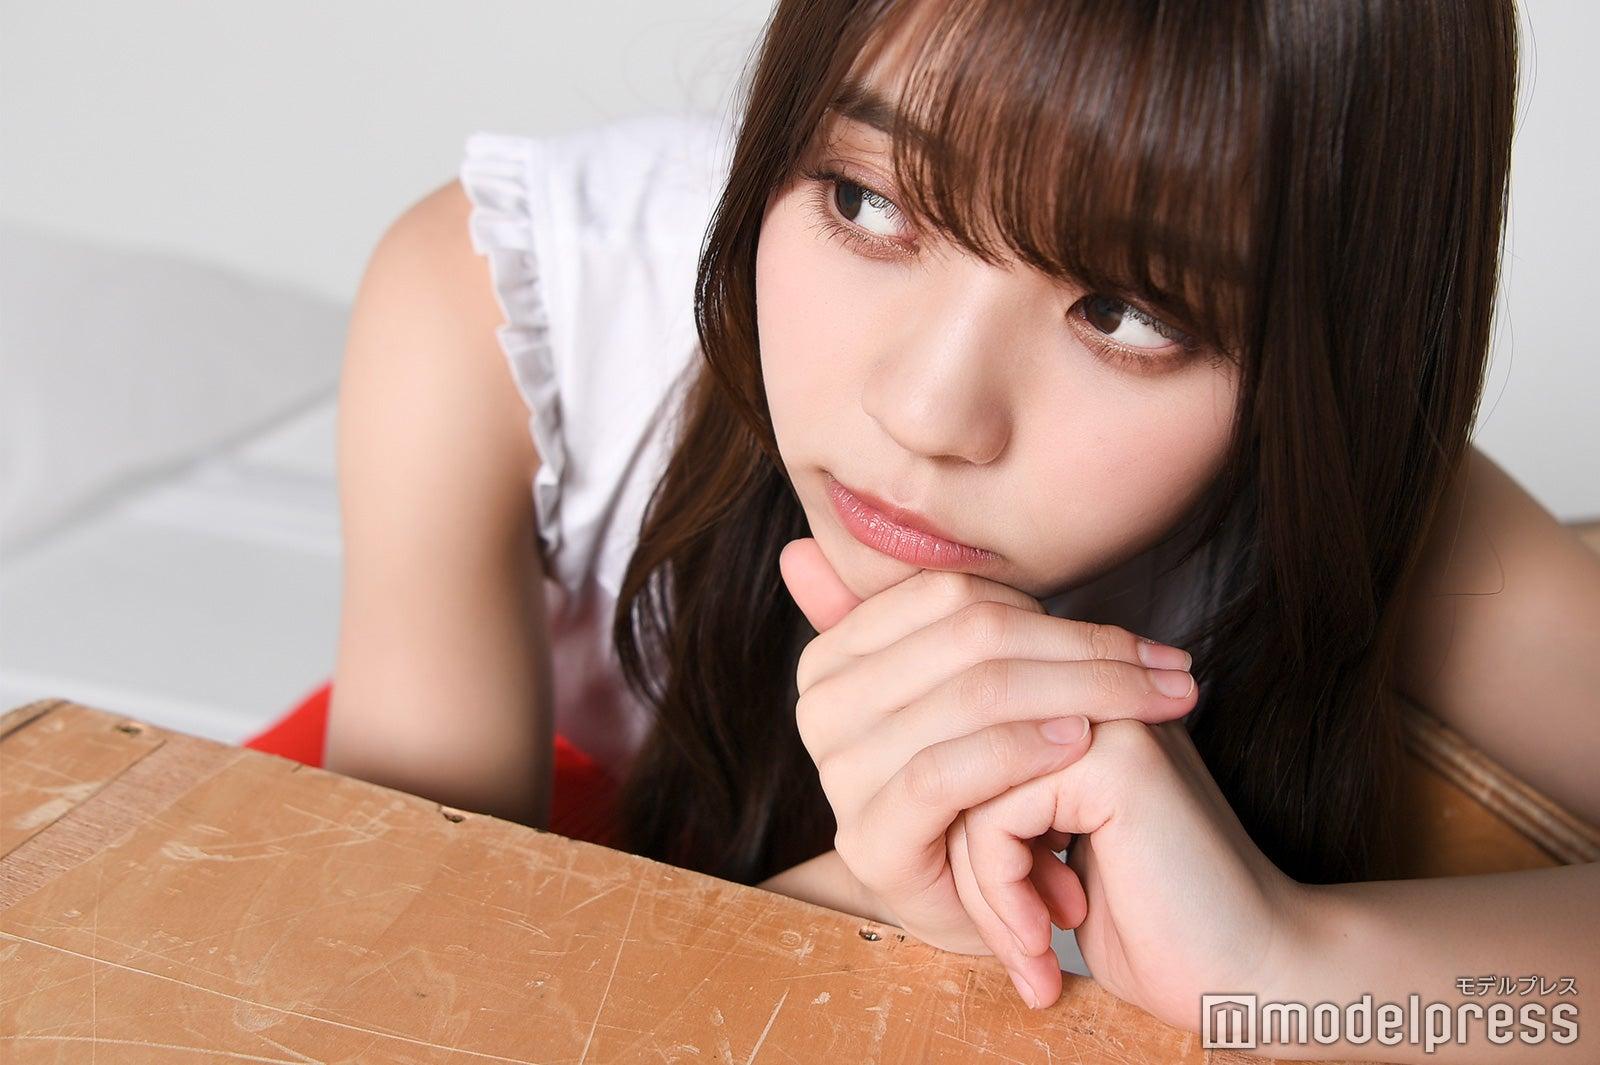 colazaka46 アイコラ 1